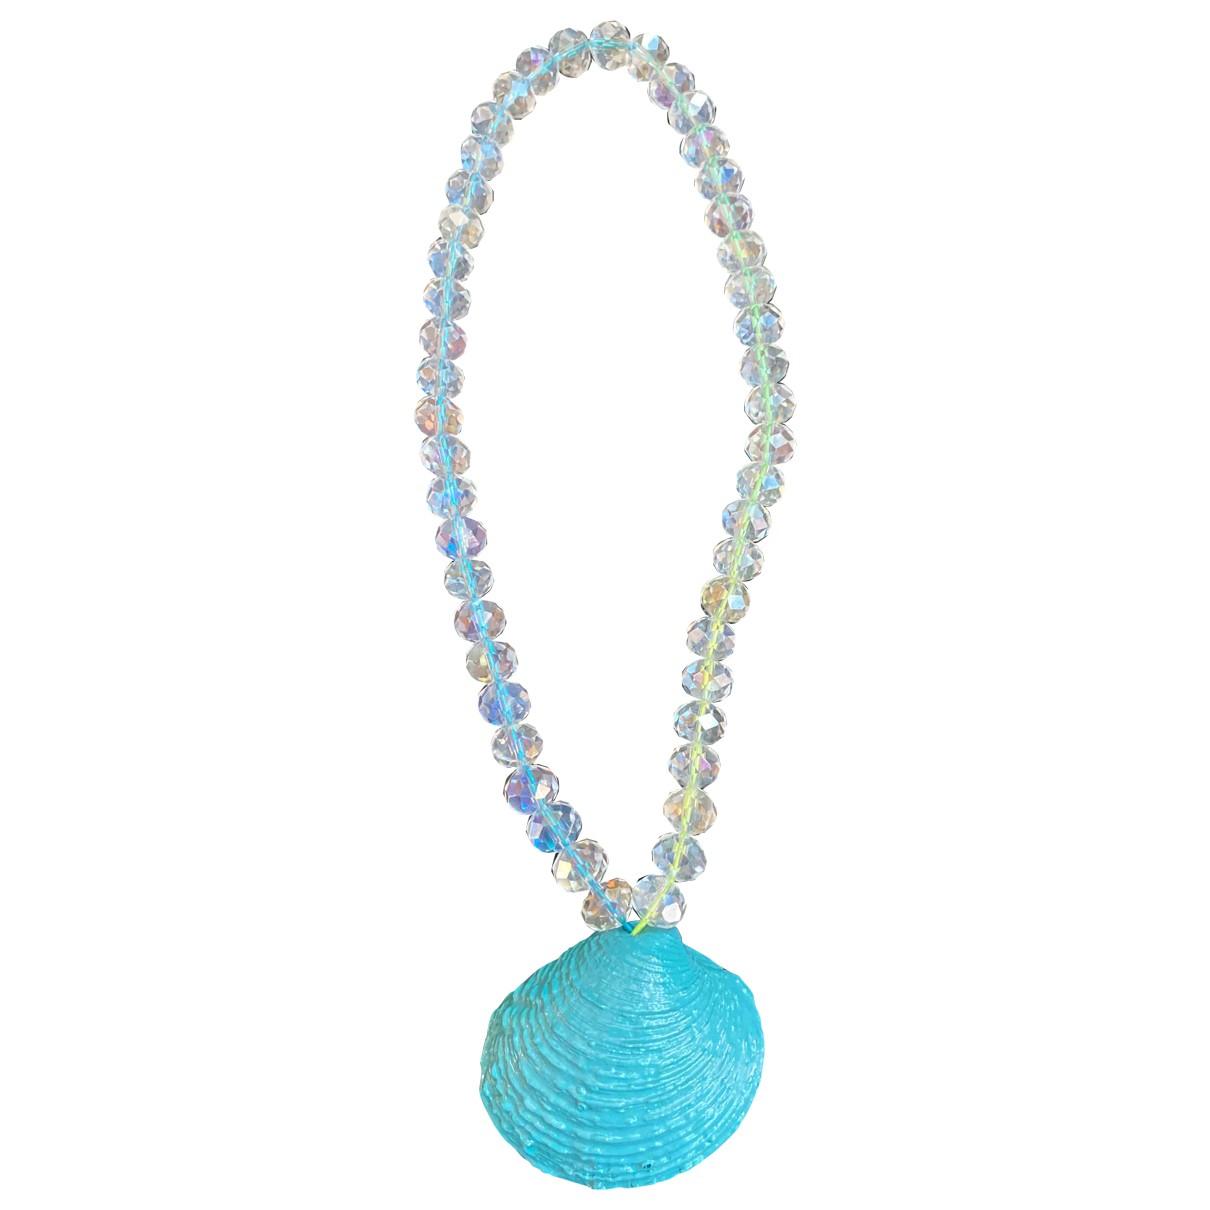 Collar Motifs Coquillages de Cristal Non Signe / Unsigned